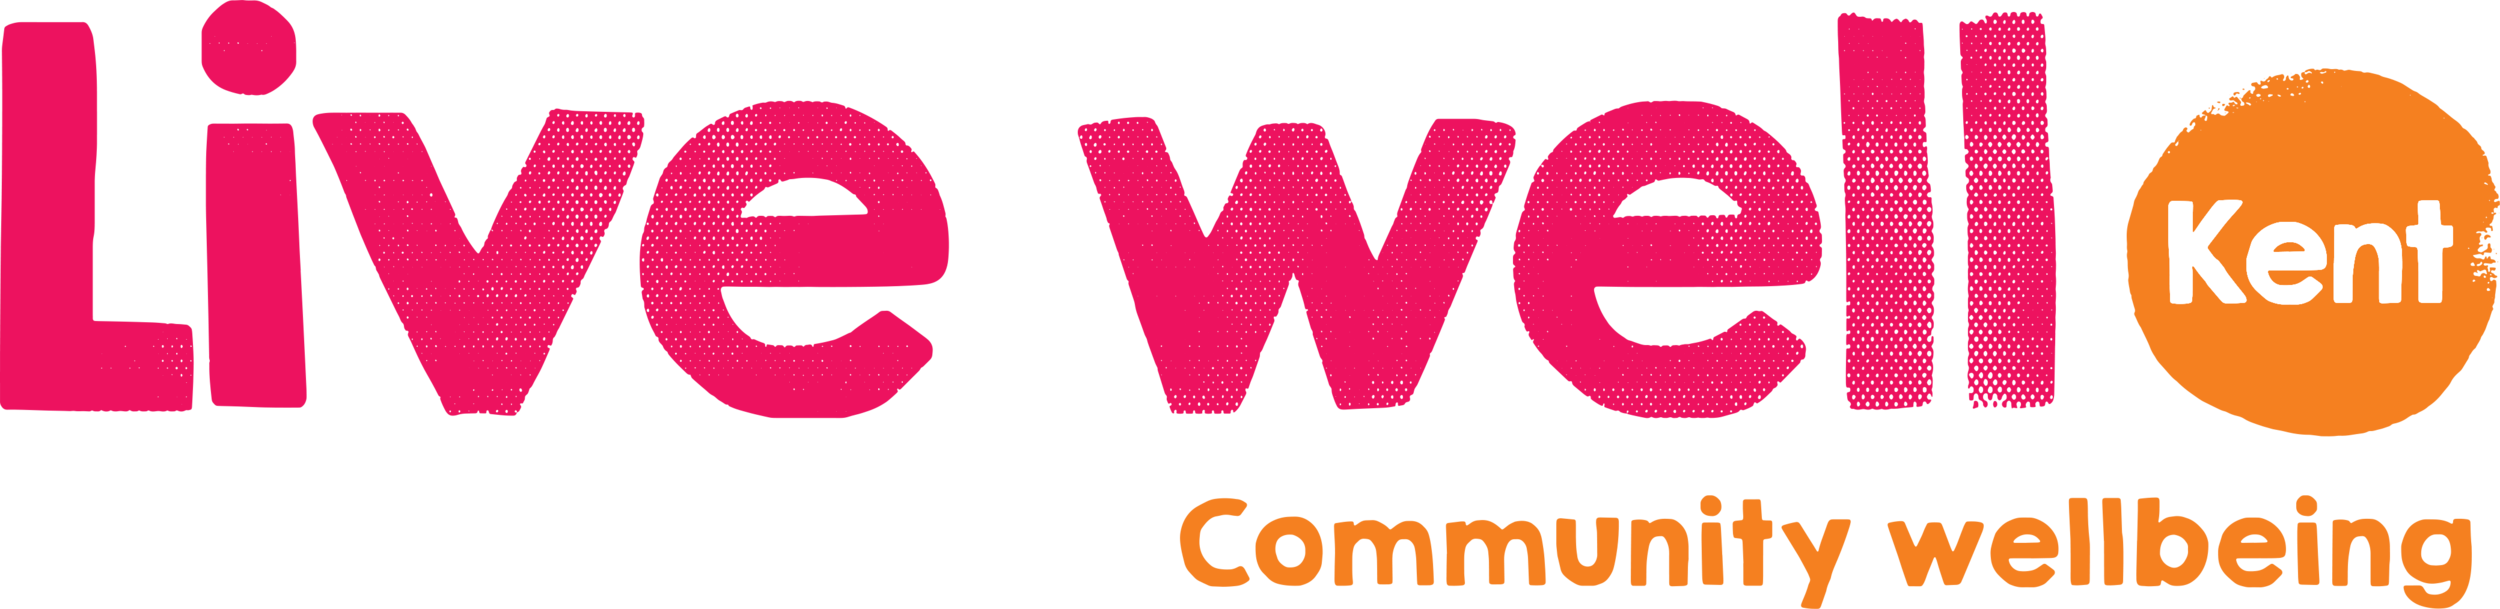 Live Well Kent Logo.png